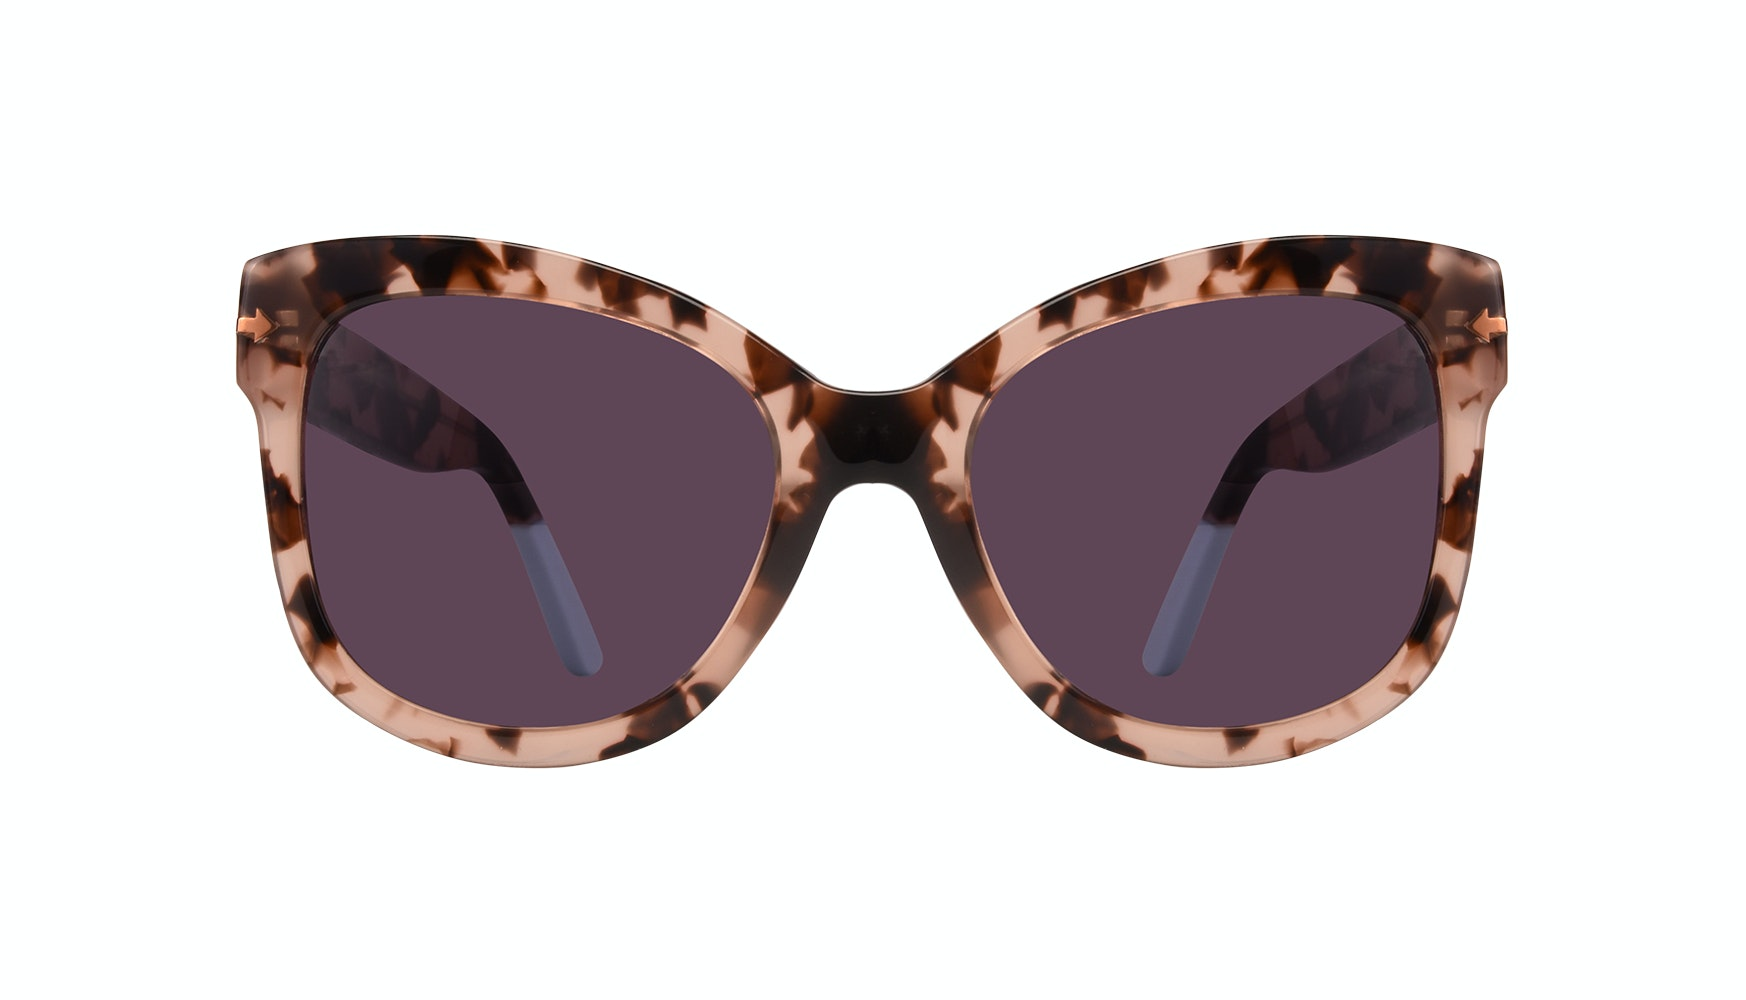 Affordable Fashion Glasses Cat Eye Square Sunglasses Women Marlo Coastal